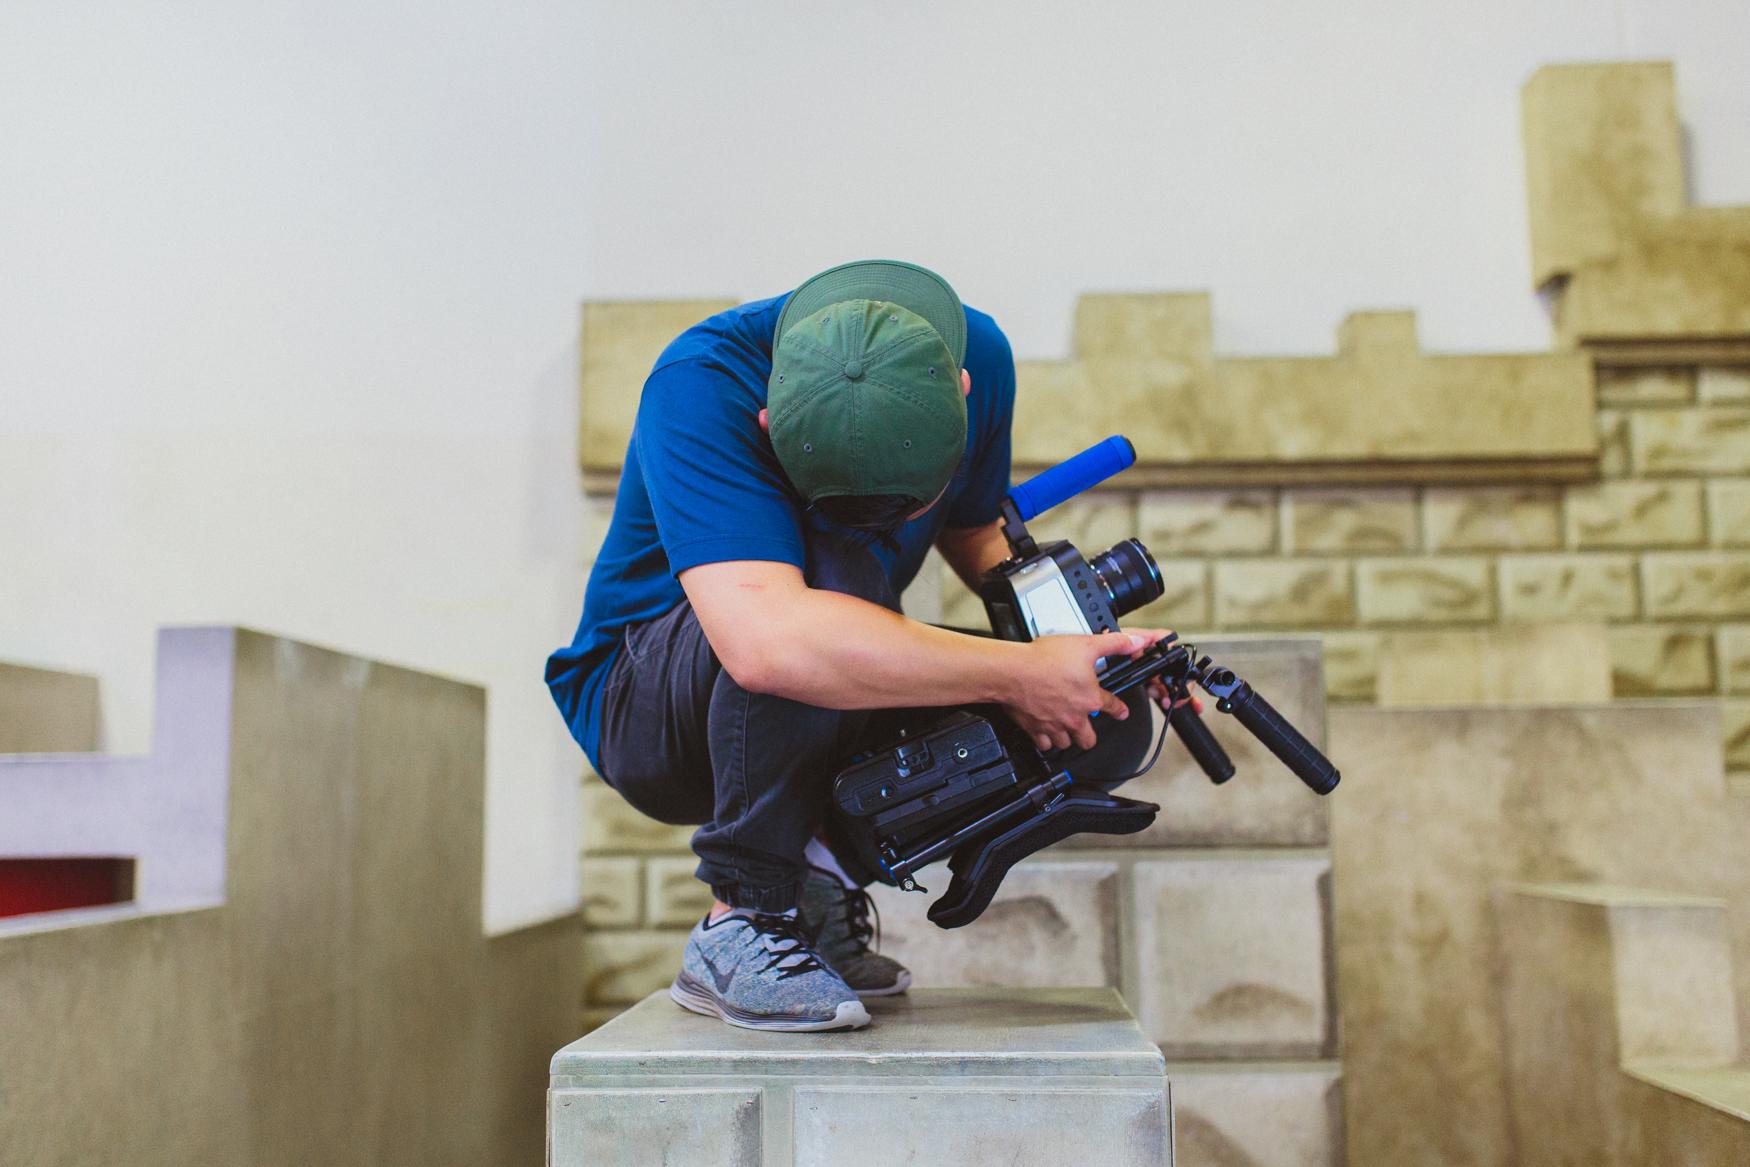 Camera man, Andrew Yi.